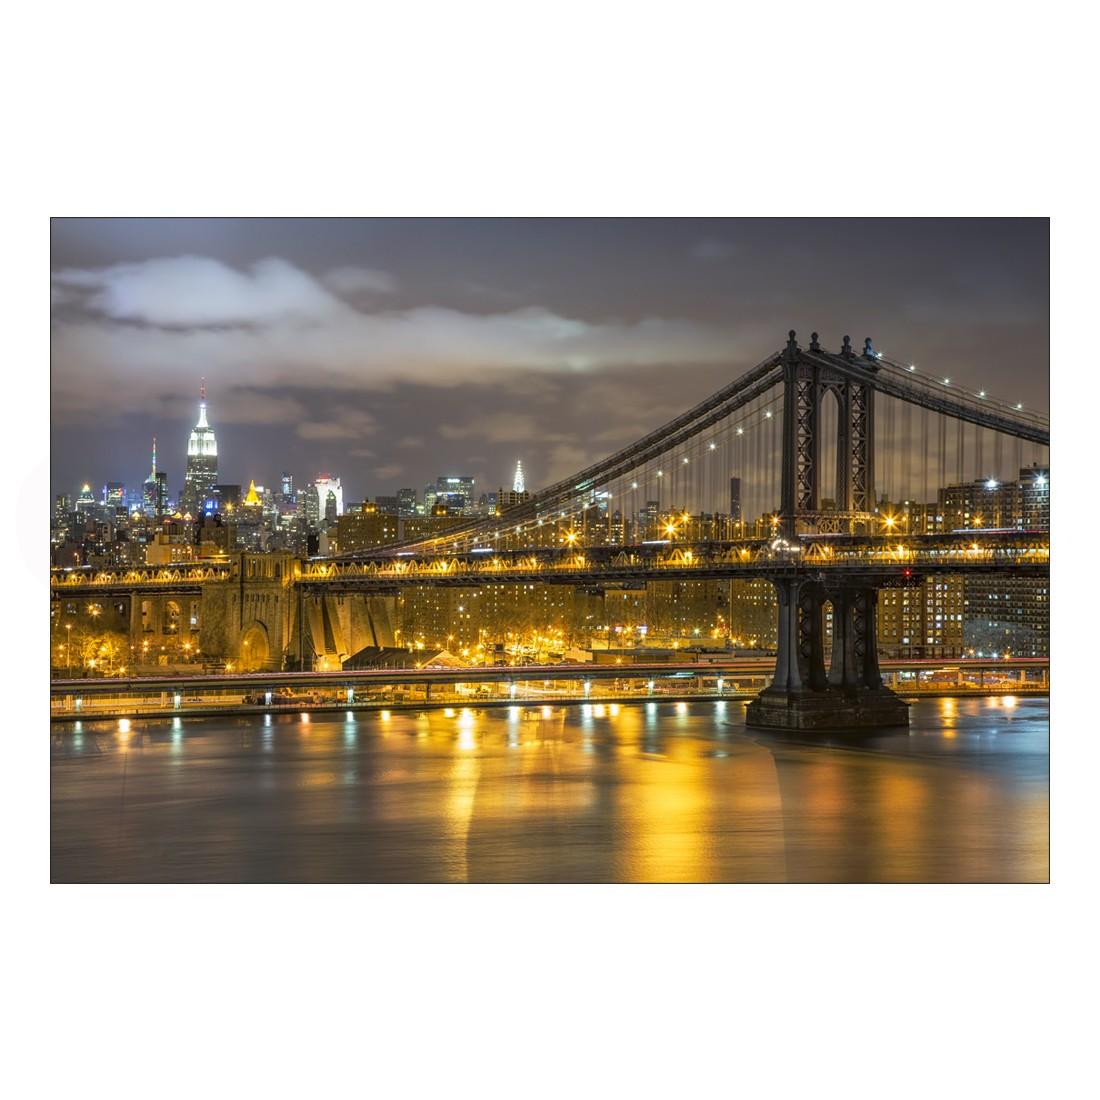 Acrylglasbild Lighting Bridge – Abmessung 75×50 cm, Gallery of Innovative Art jetzt kaufen